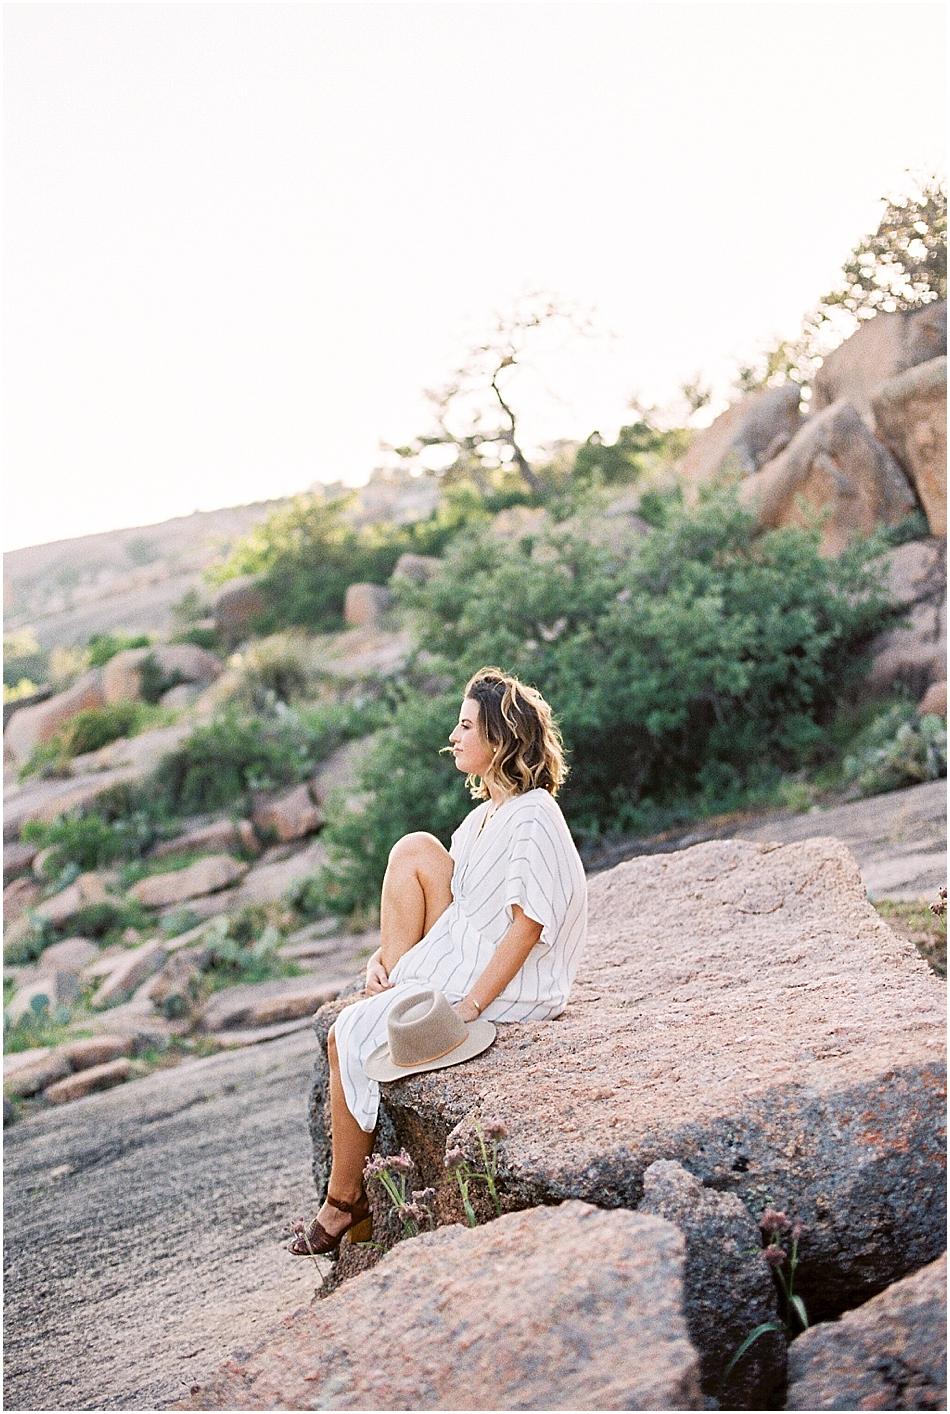 Emilie Anne Photography   Fine Art Film   Central Texas   Enchanted Rock   Seniors-11.jpg